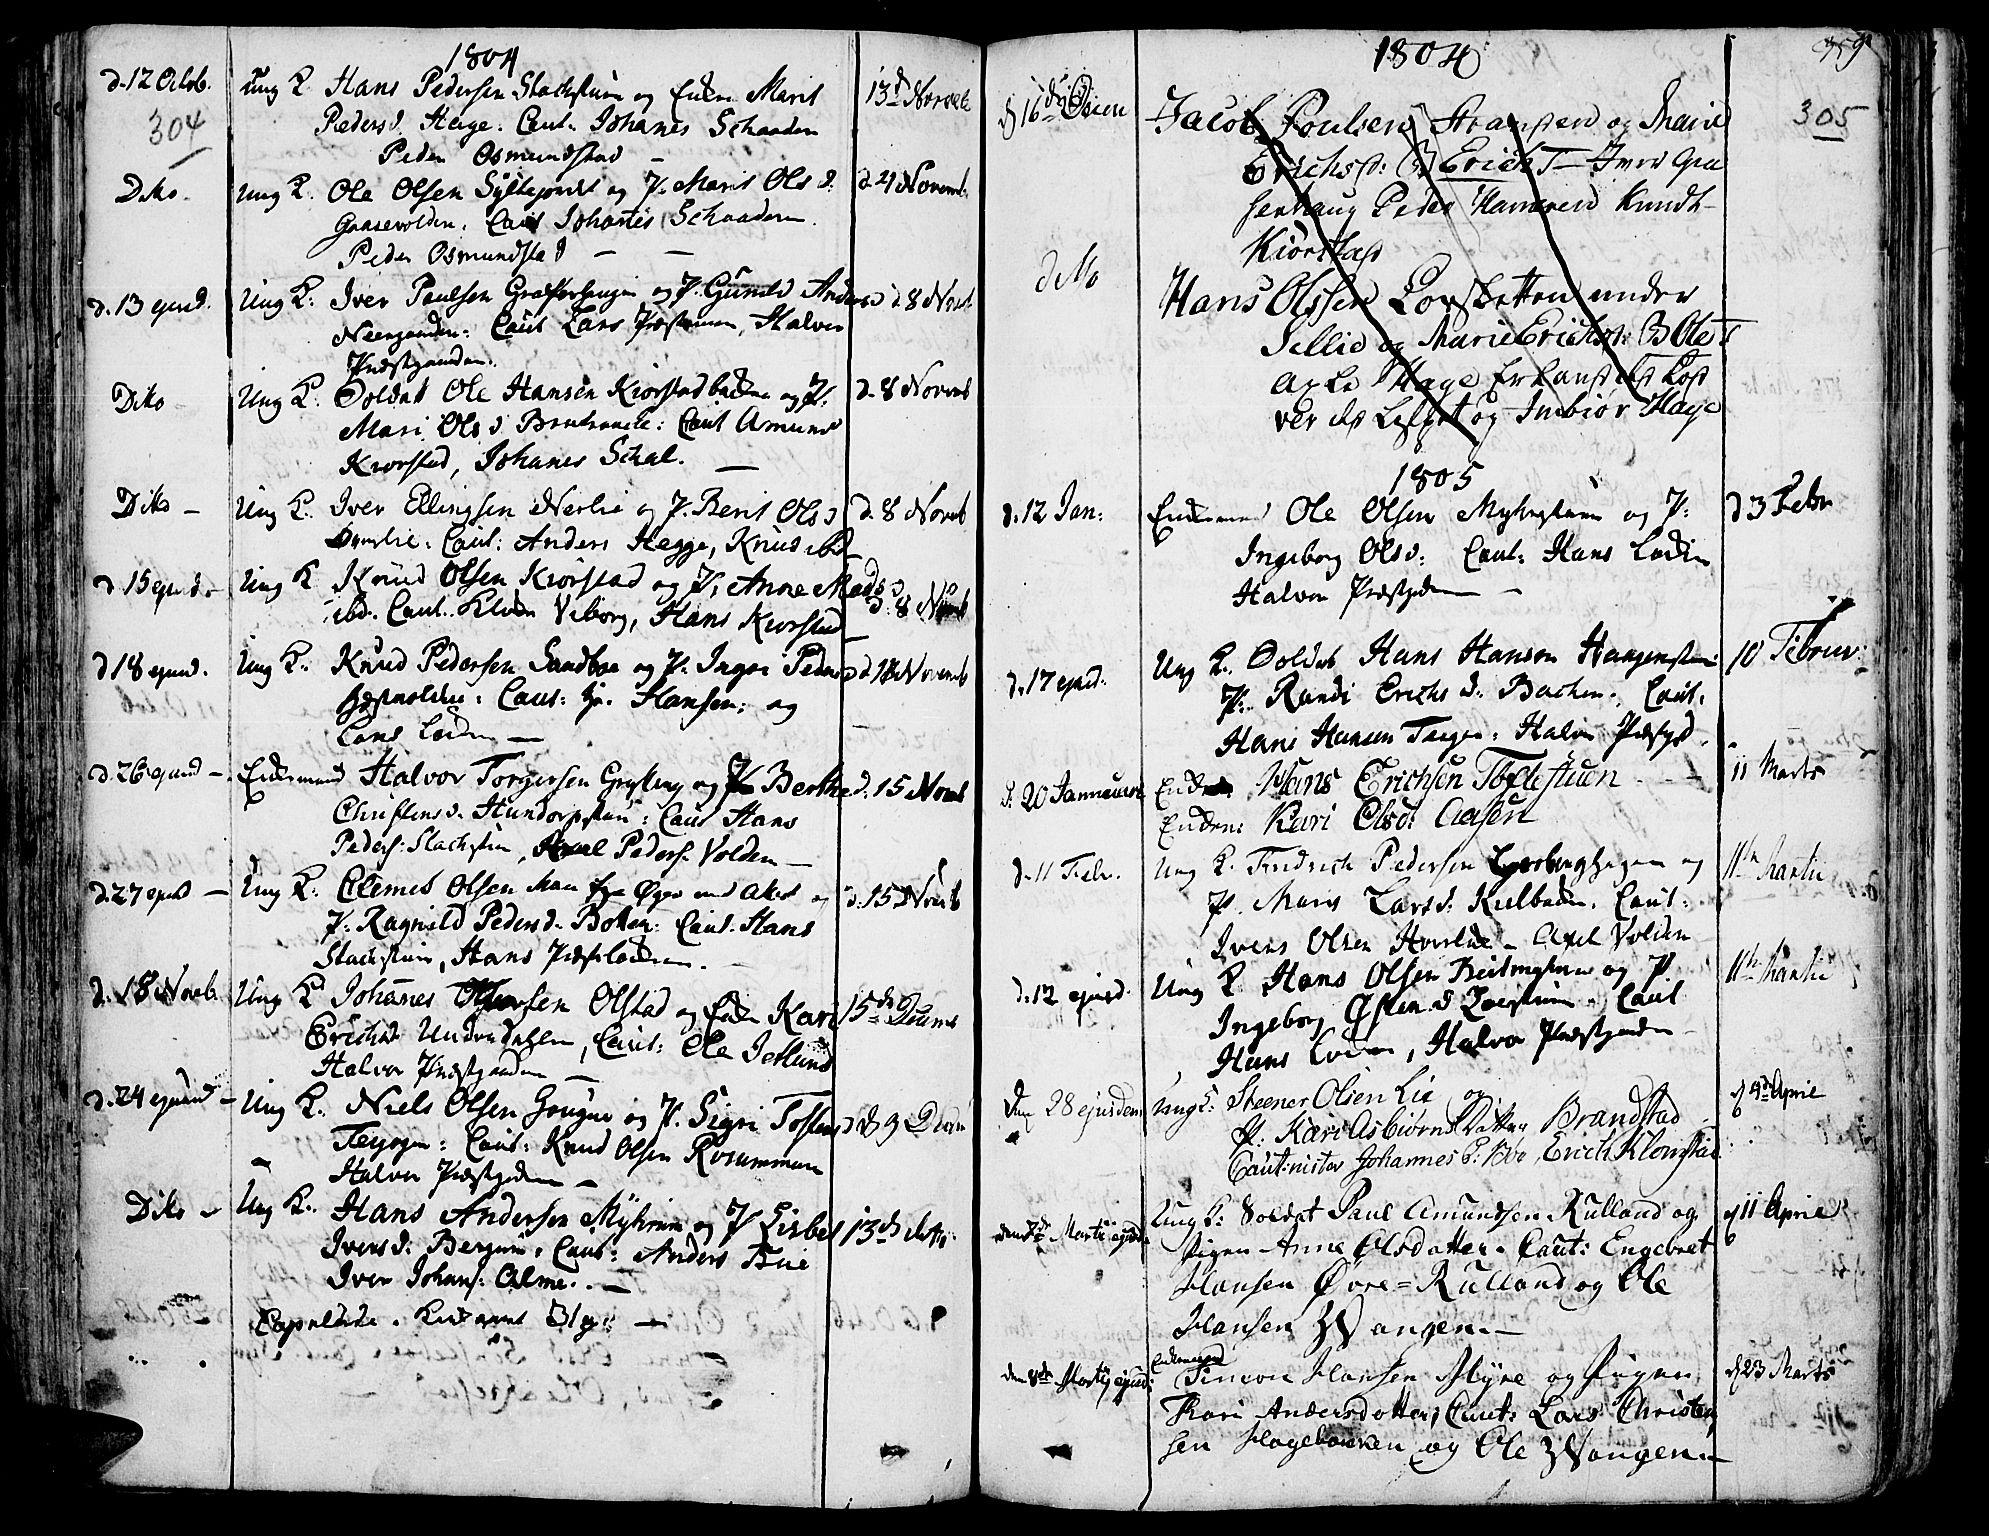 SAH, Fron prestekontor, H/Ha/Haa/L0001: Ministerialbok nr. 1, 1799-1816, s. 304-305